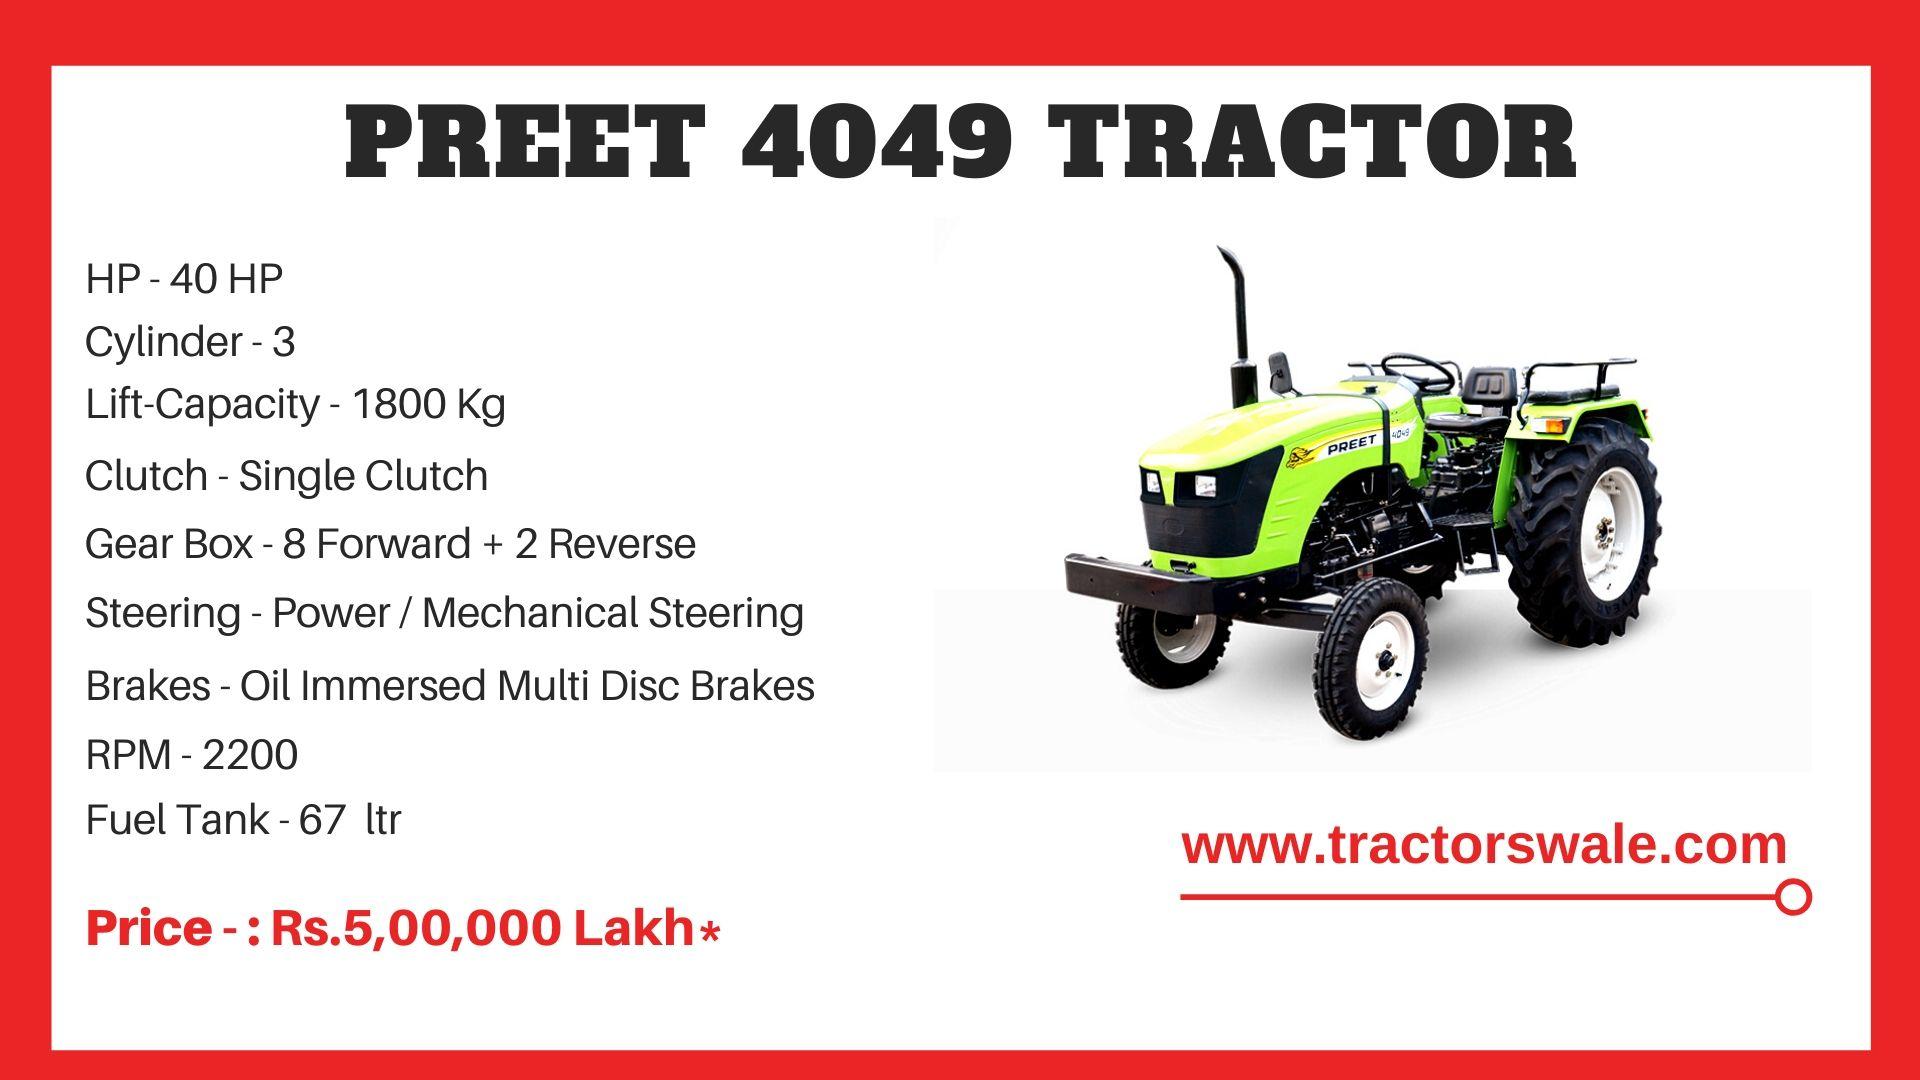 Preet 4049 tractor price